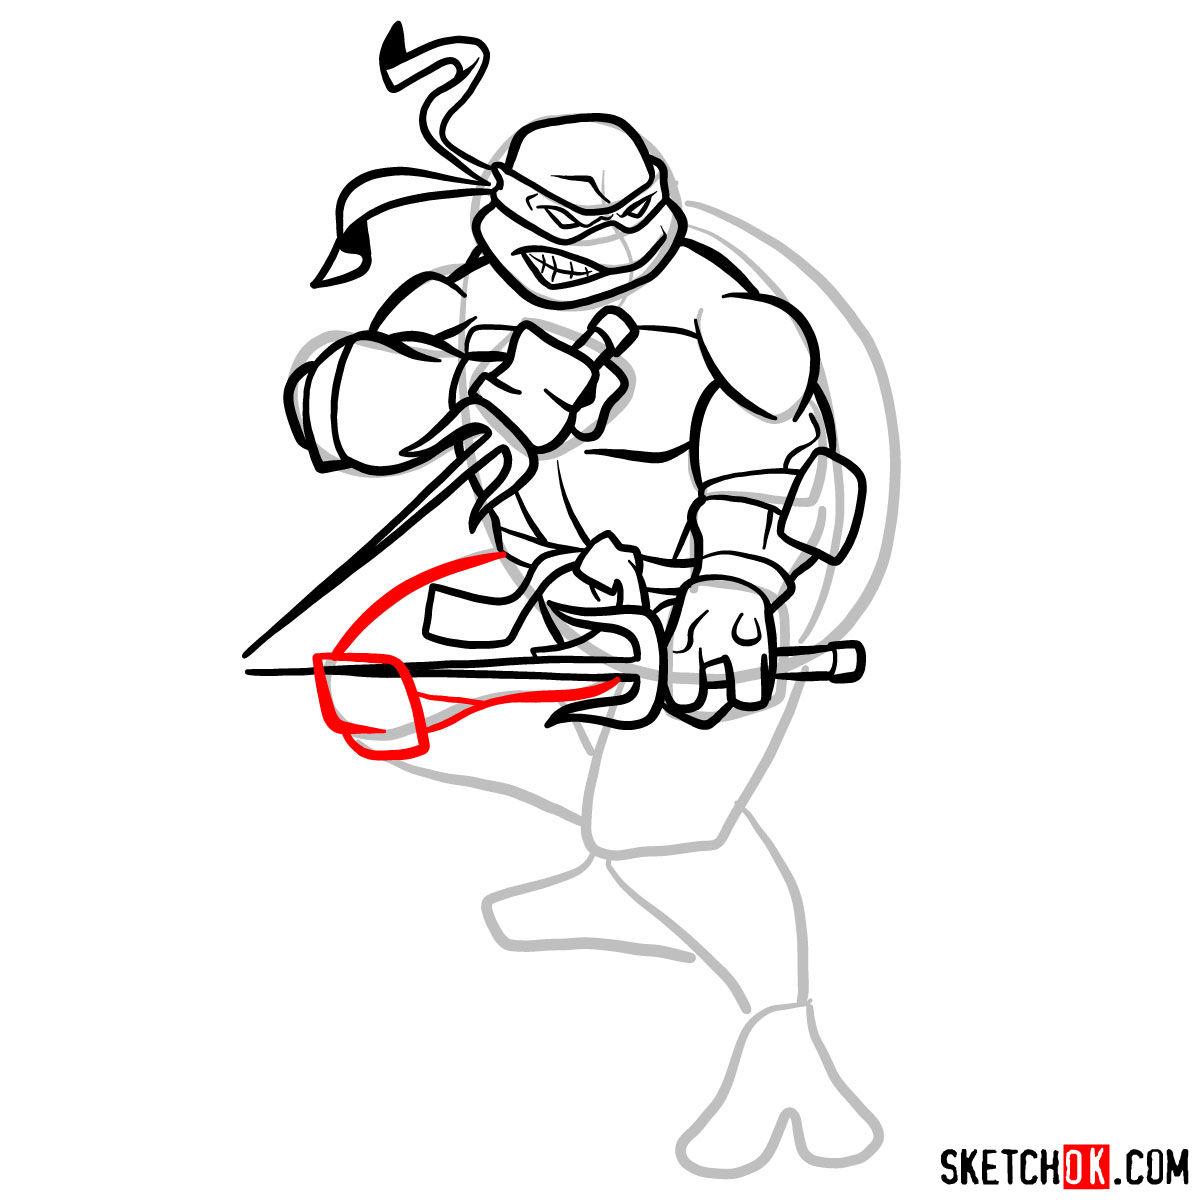 How to draw angry Raphael teenage mutant ninja turtle - step 10